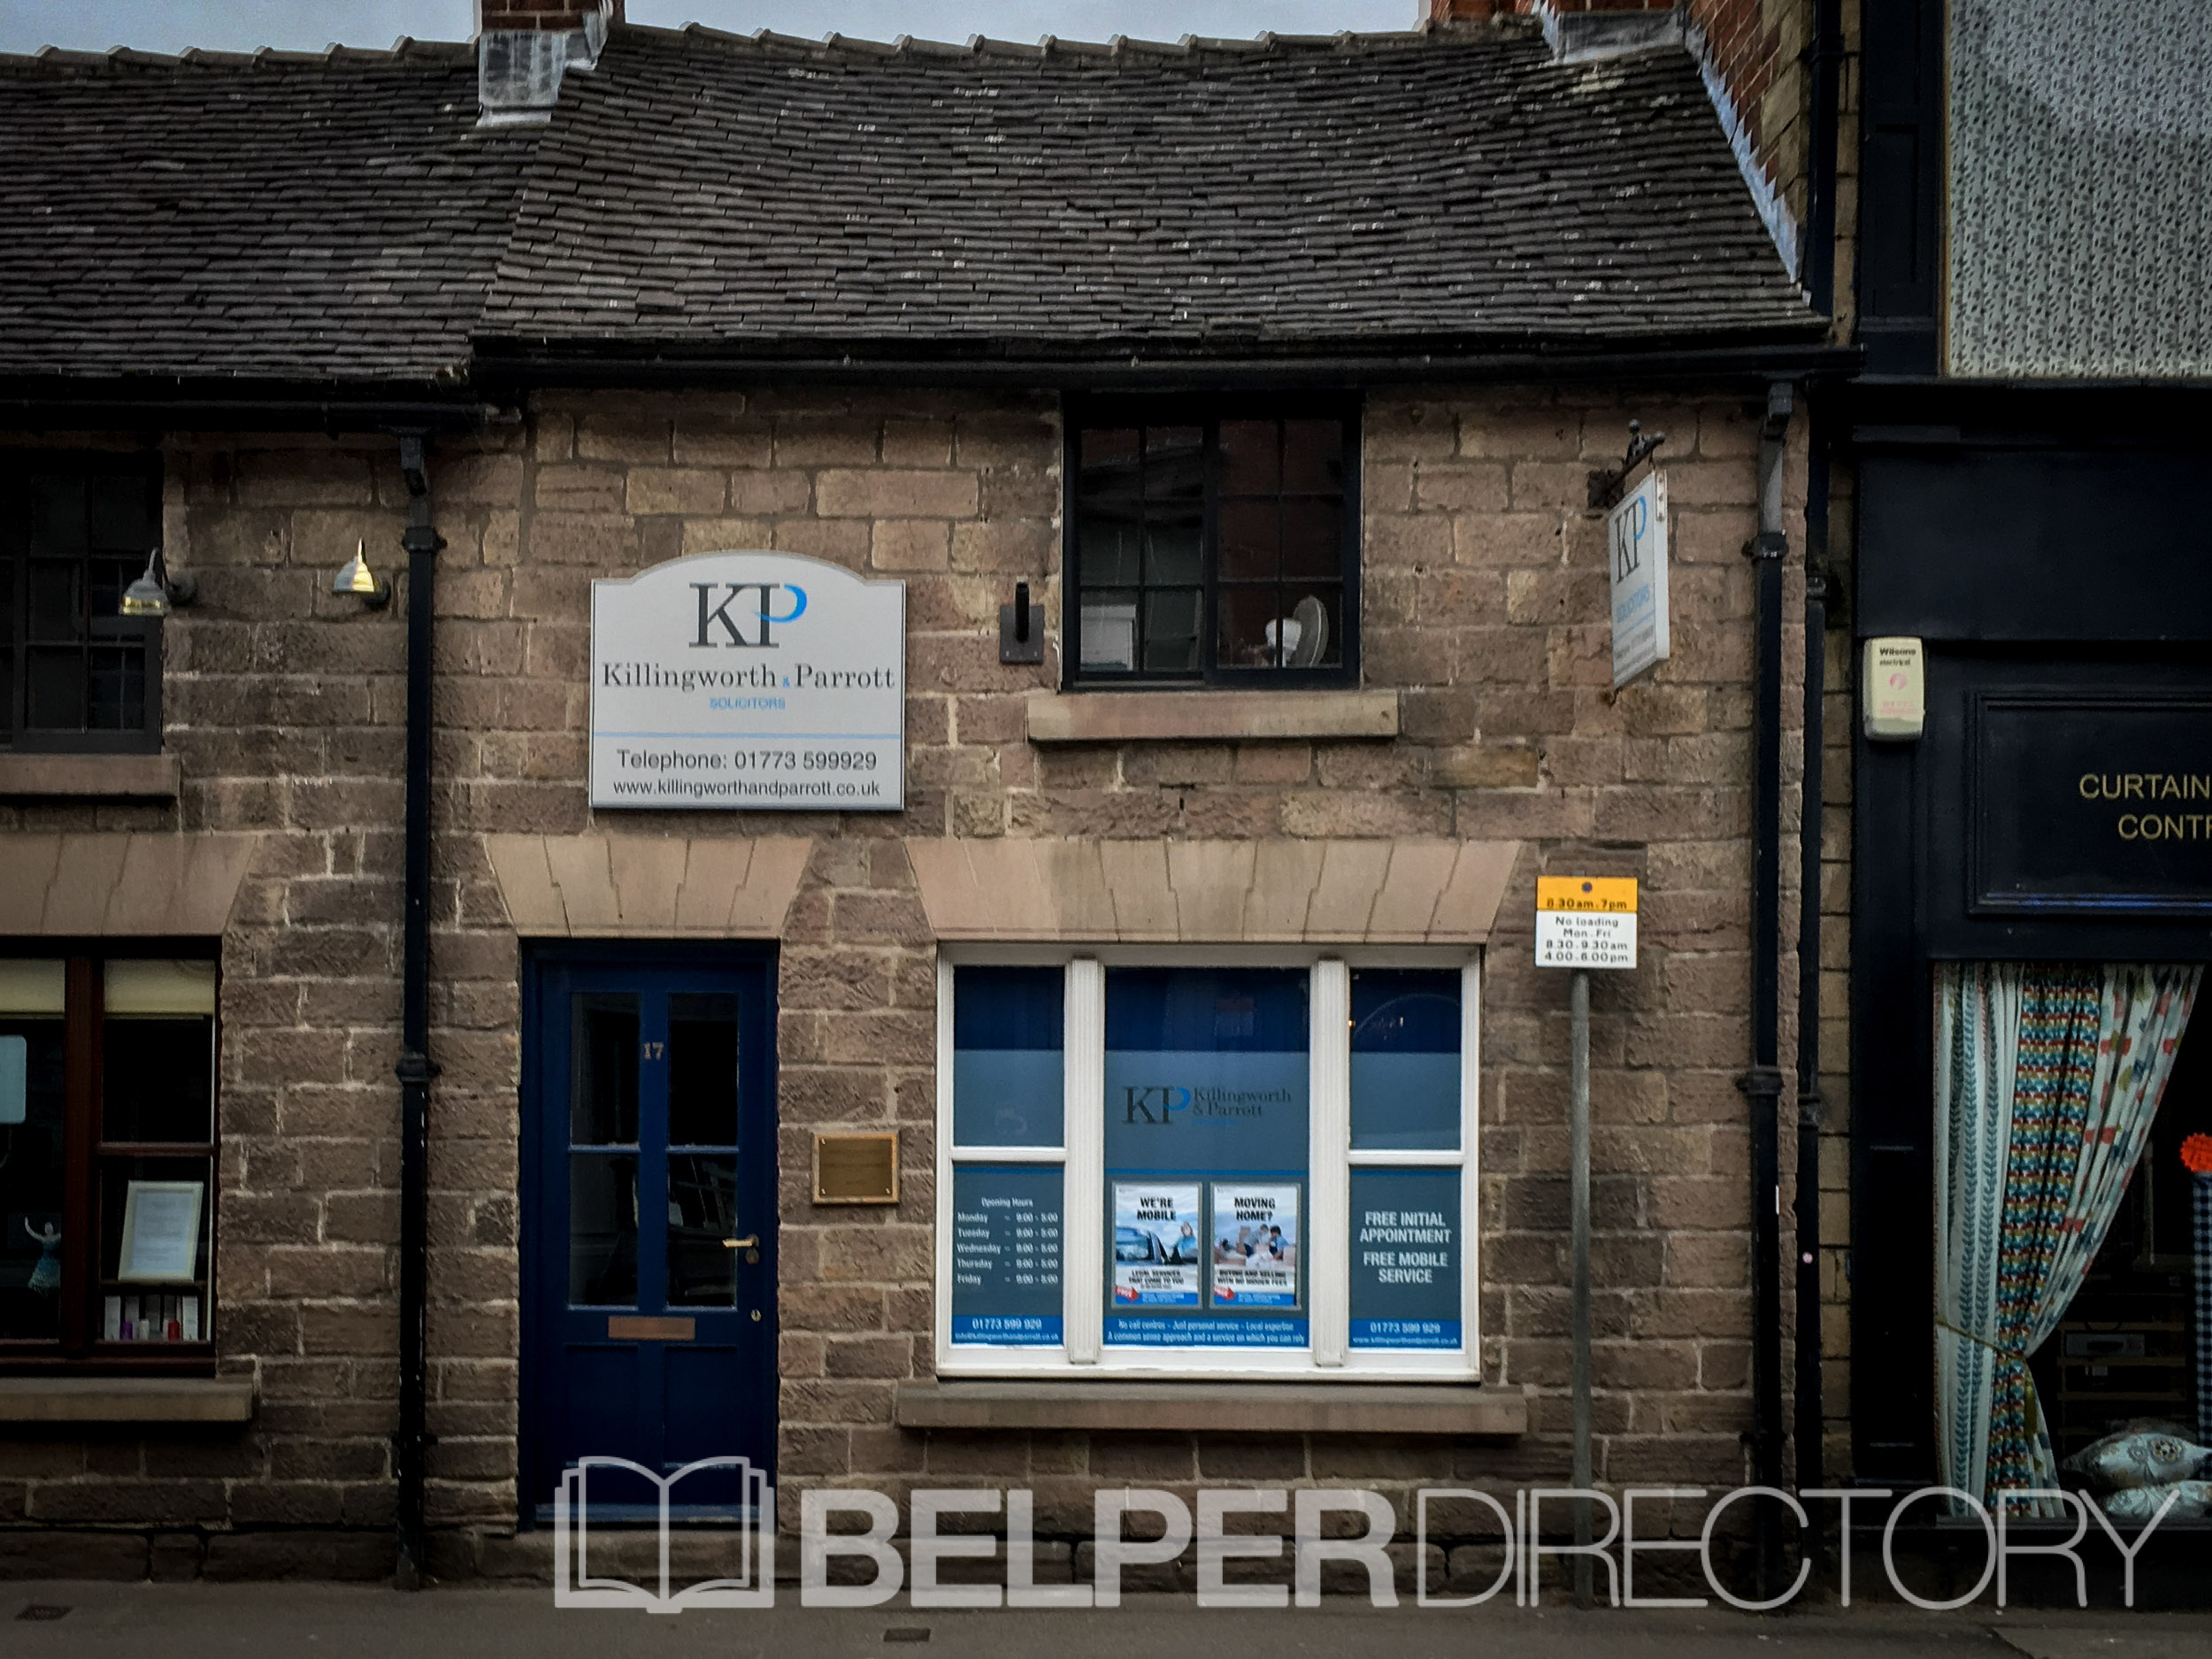 Killingworth & Parrott Solicitors on Inter Search